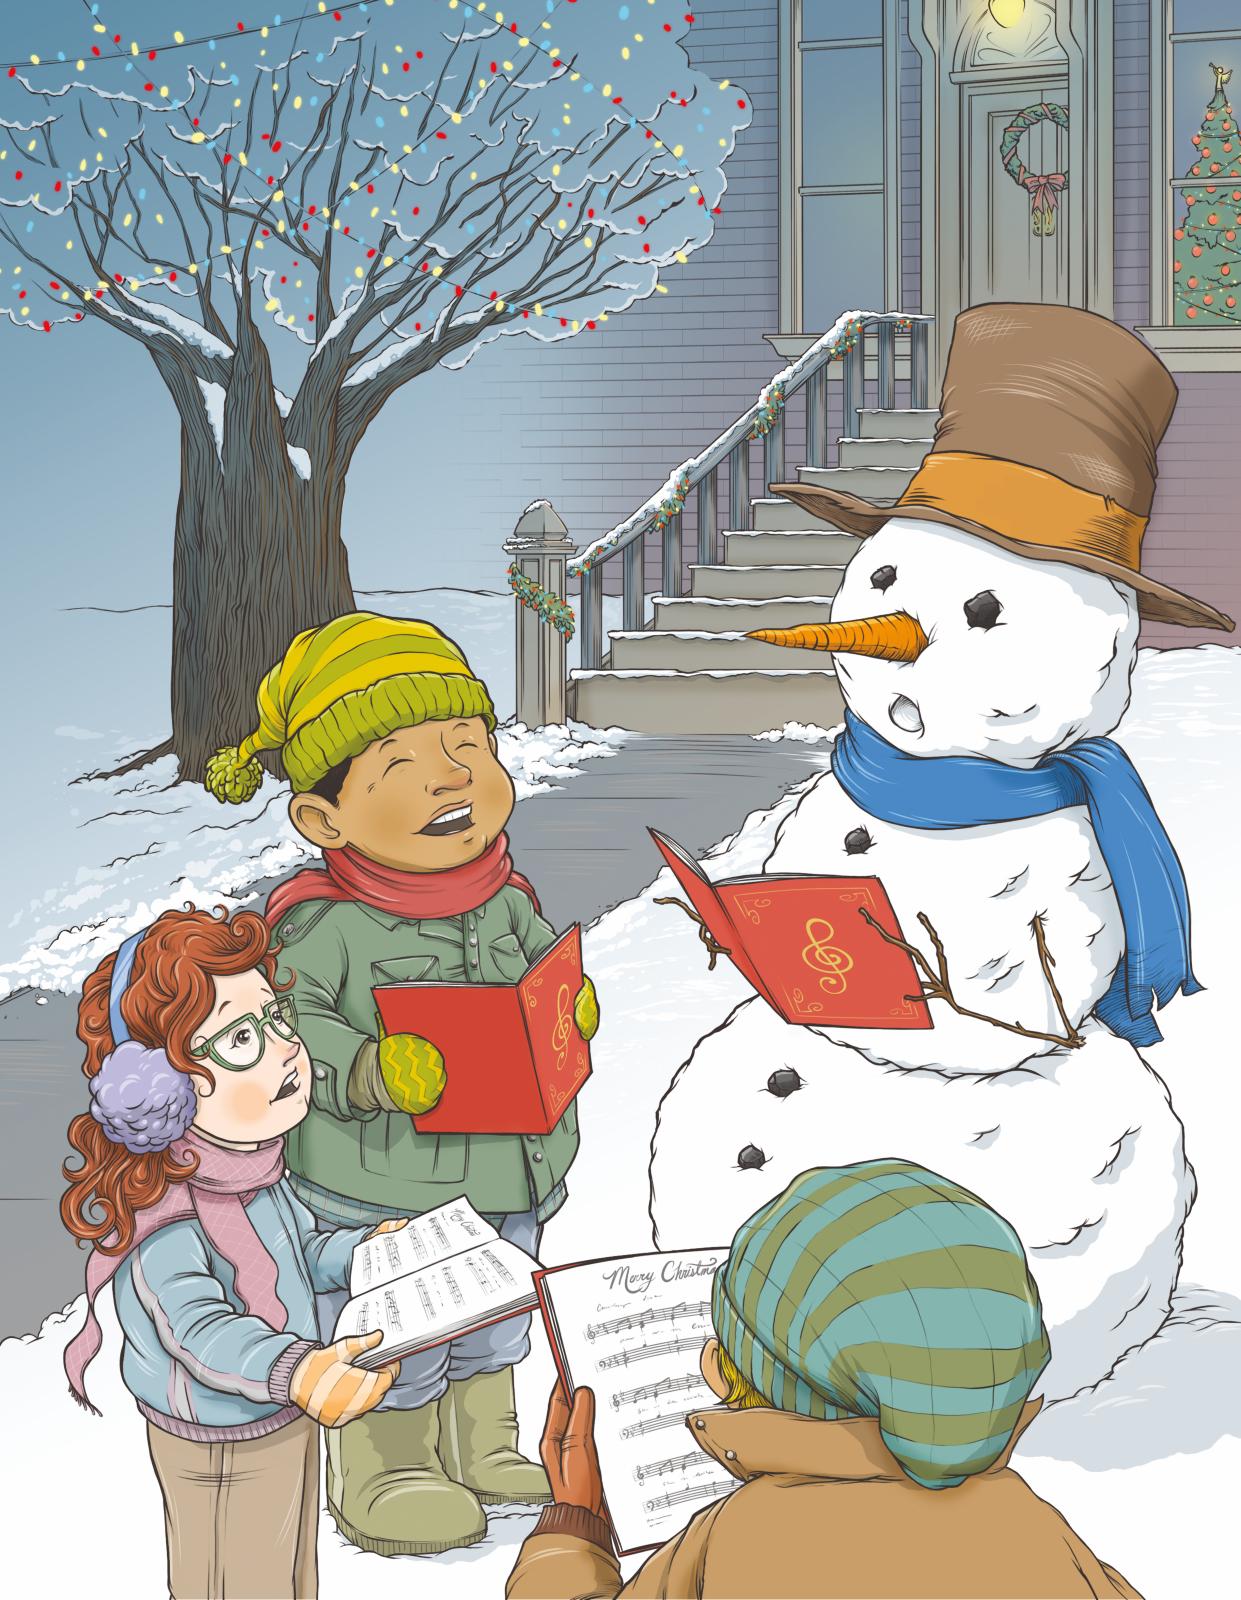 Caroling clipart winter. Christmas share